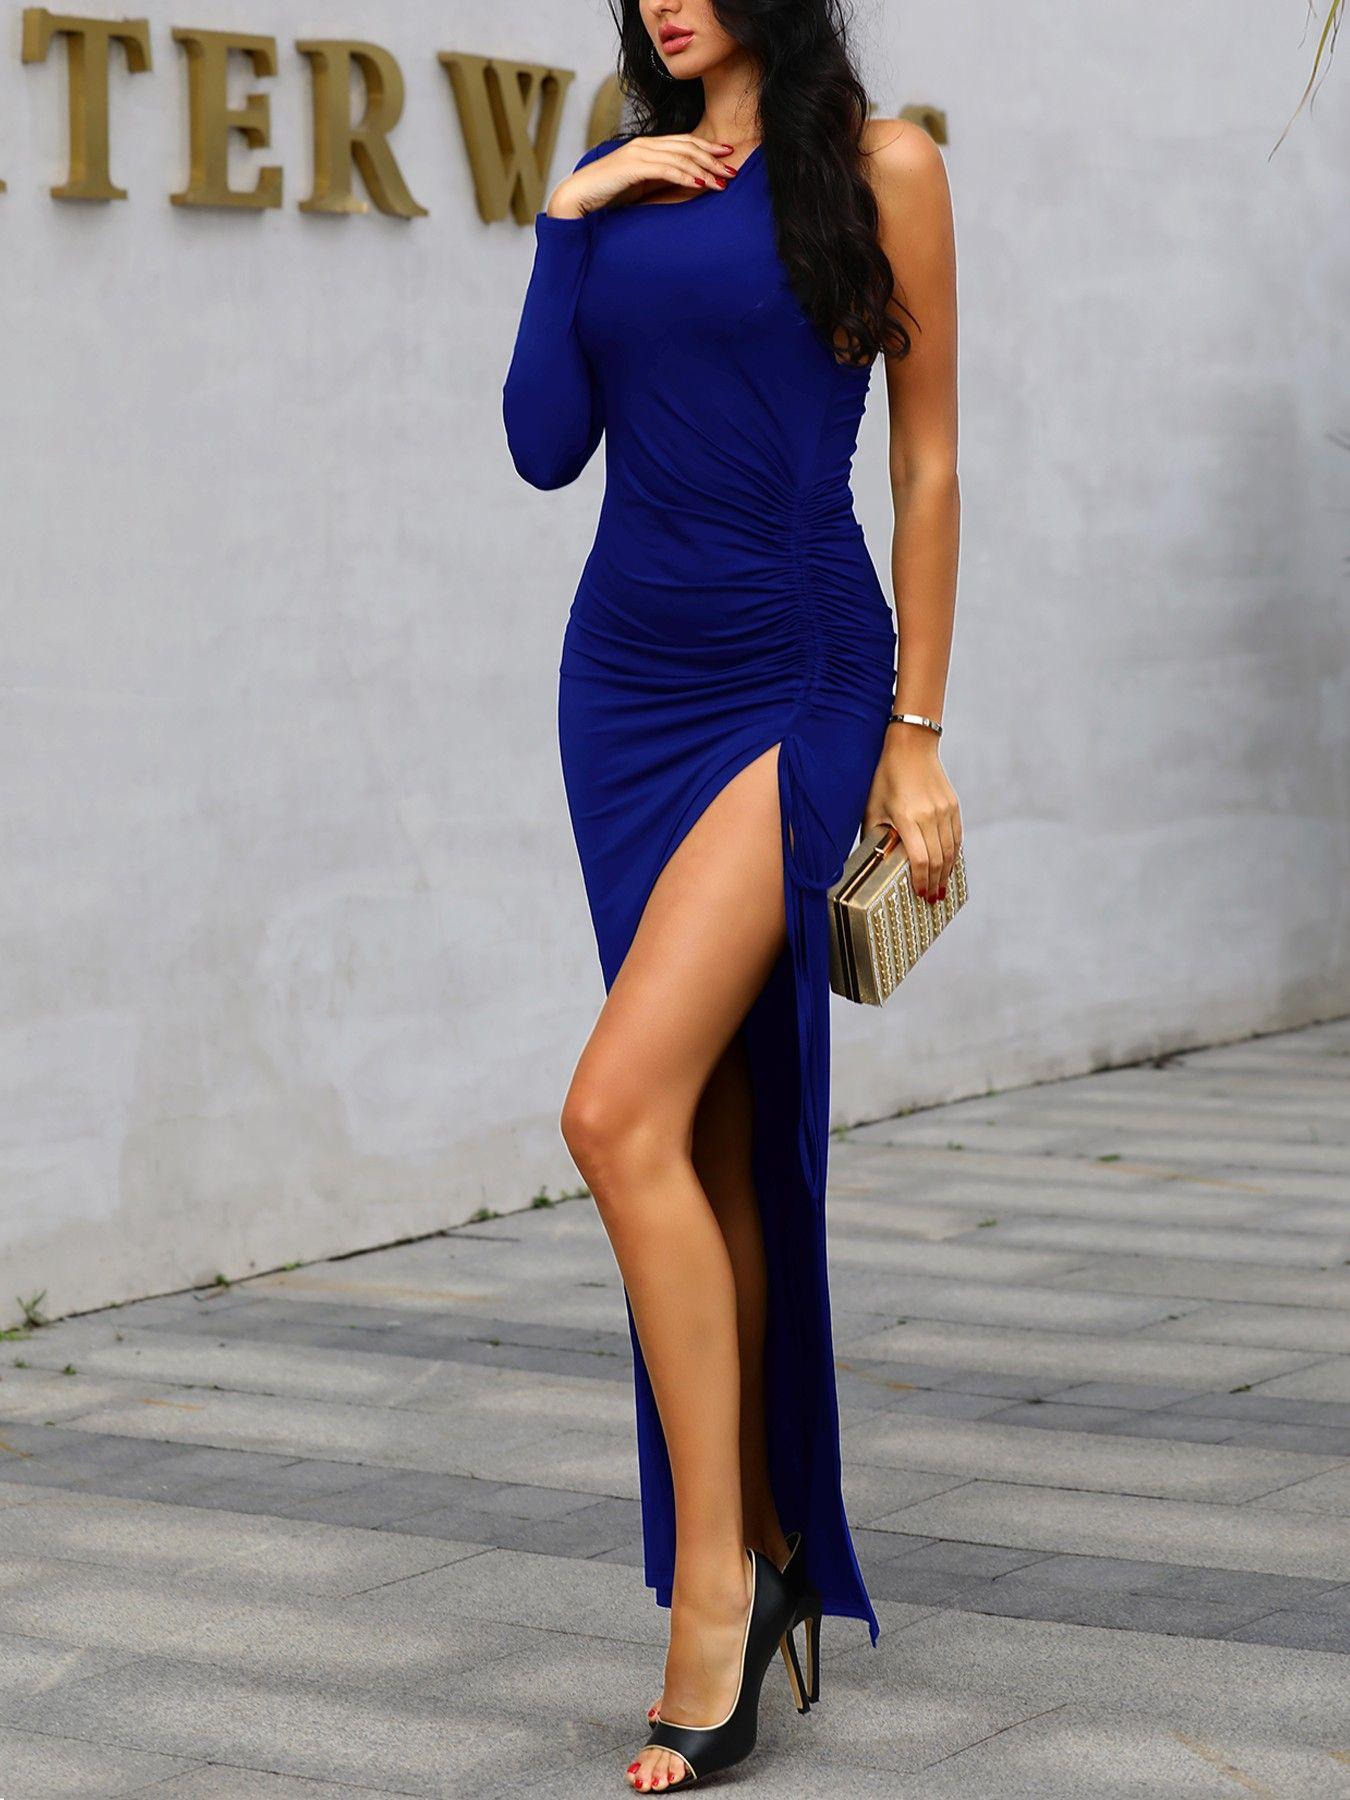 One Long Sleeve Thigh Slit Evening Dress V 2019 G Buy Dresses